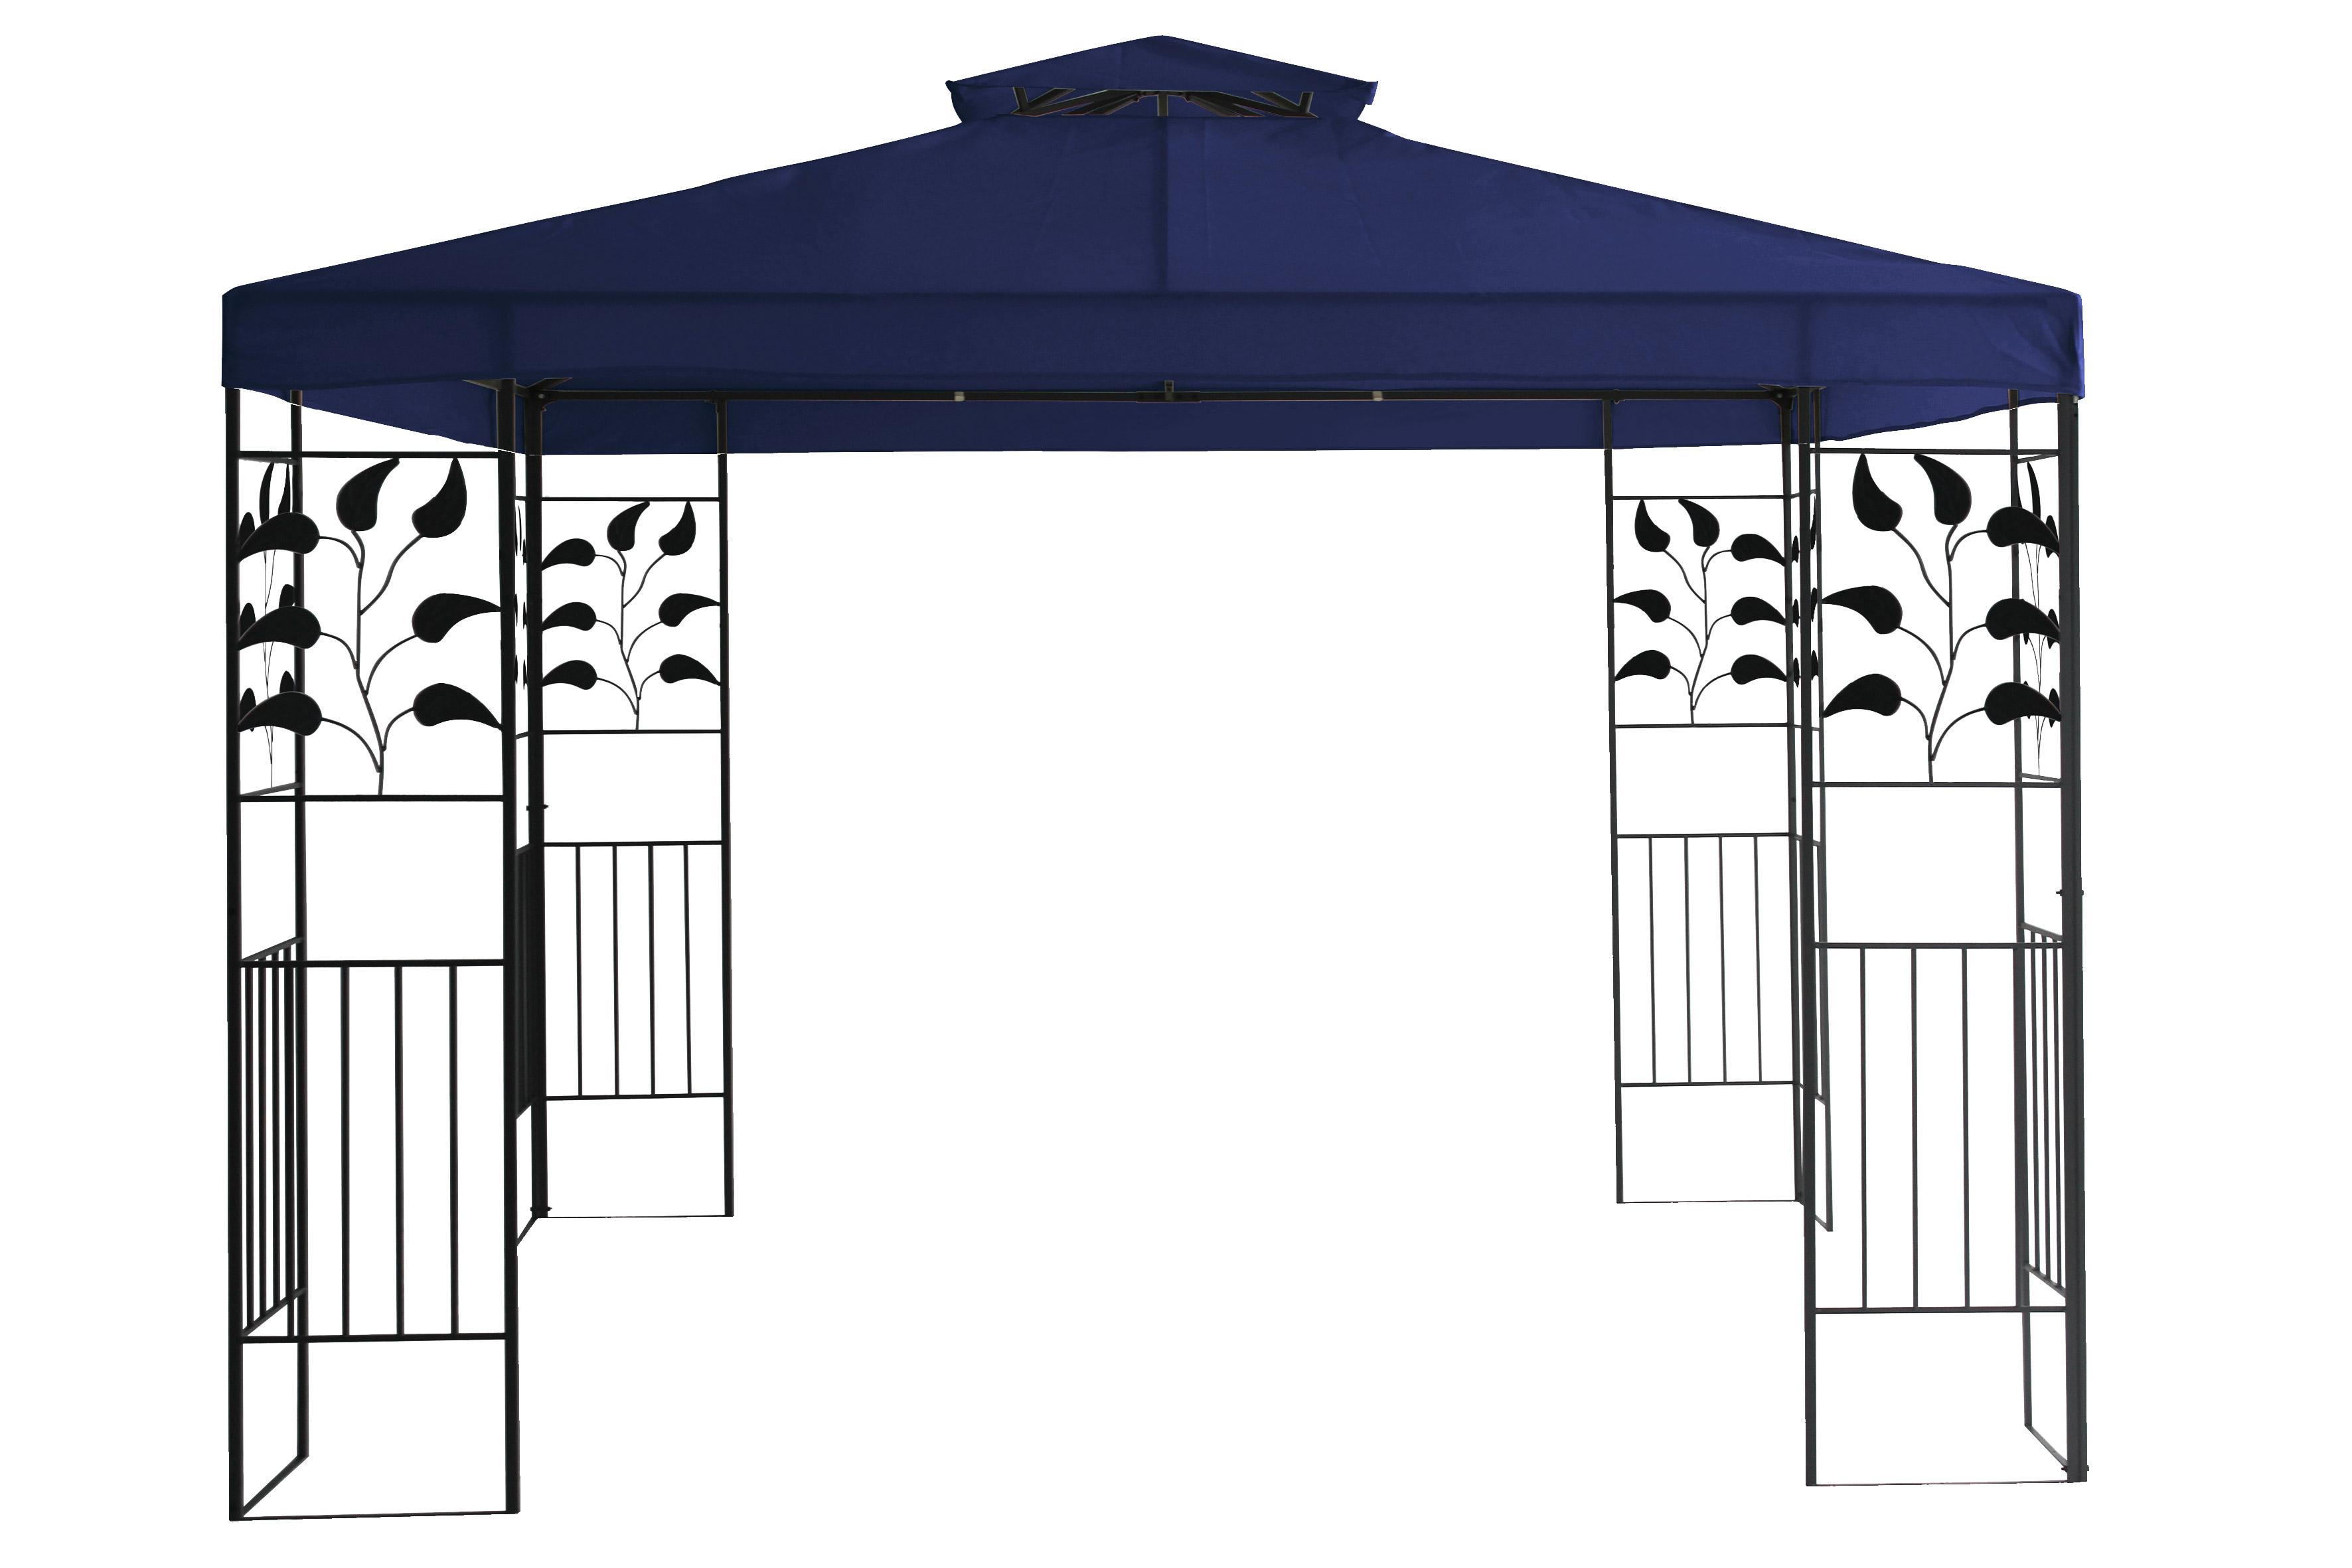 pavillon metall 3x3 gallery of beige seitenteile seitenwnde mit fenster fr x m pavillon metall. Black Bedroom Furniture Sets. Home Design Ideas